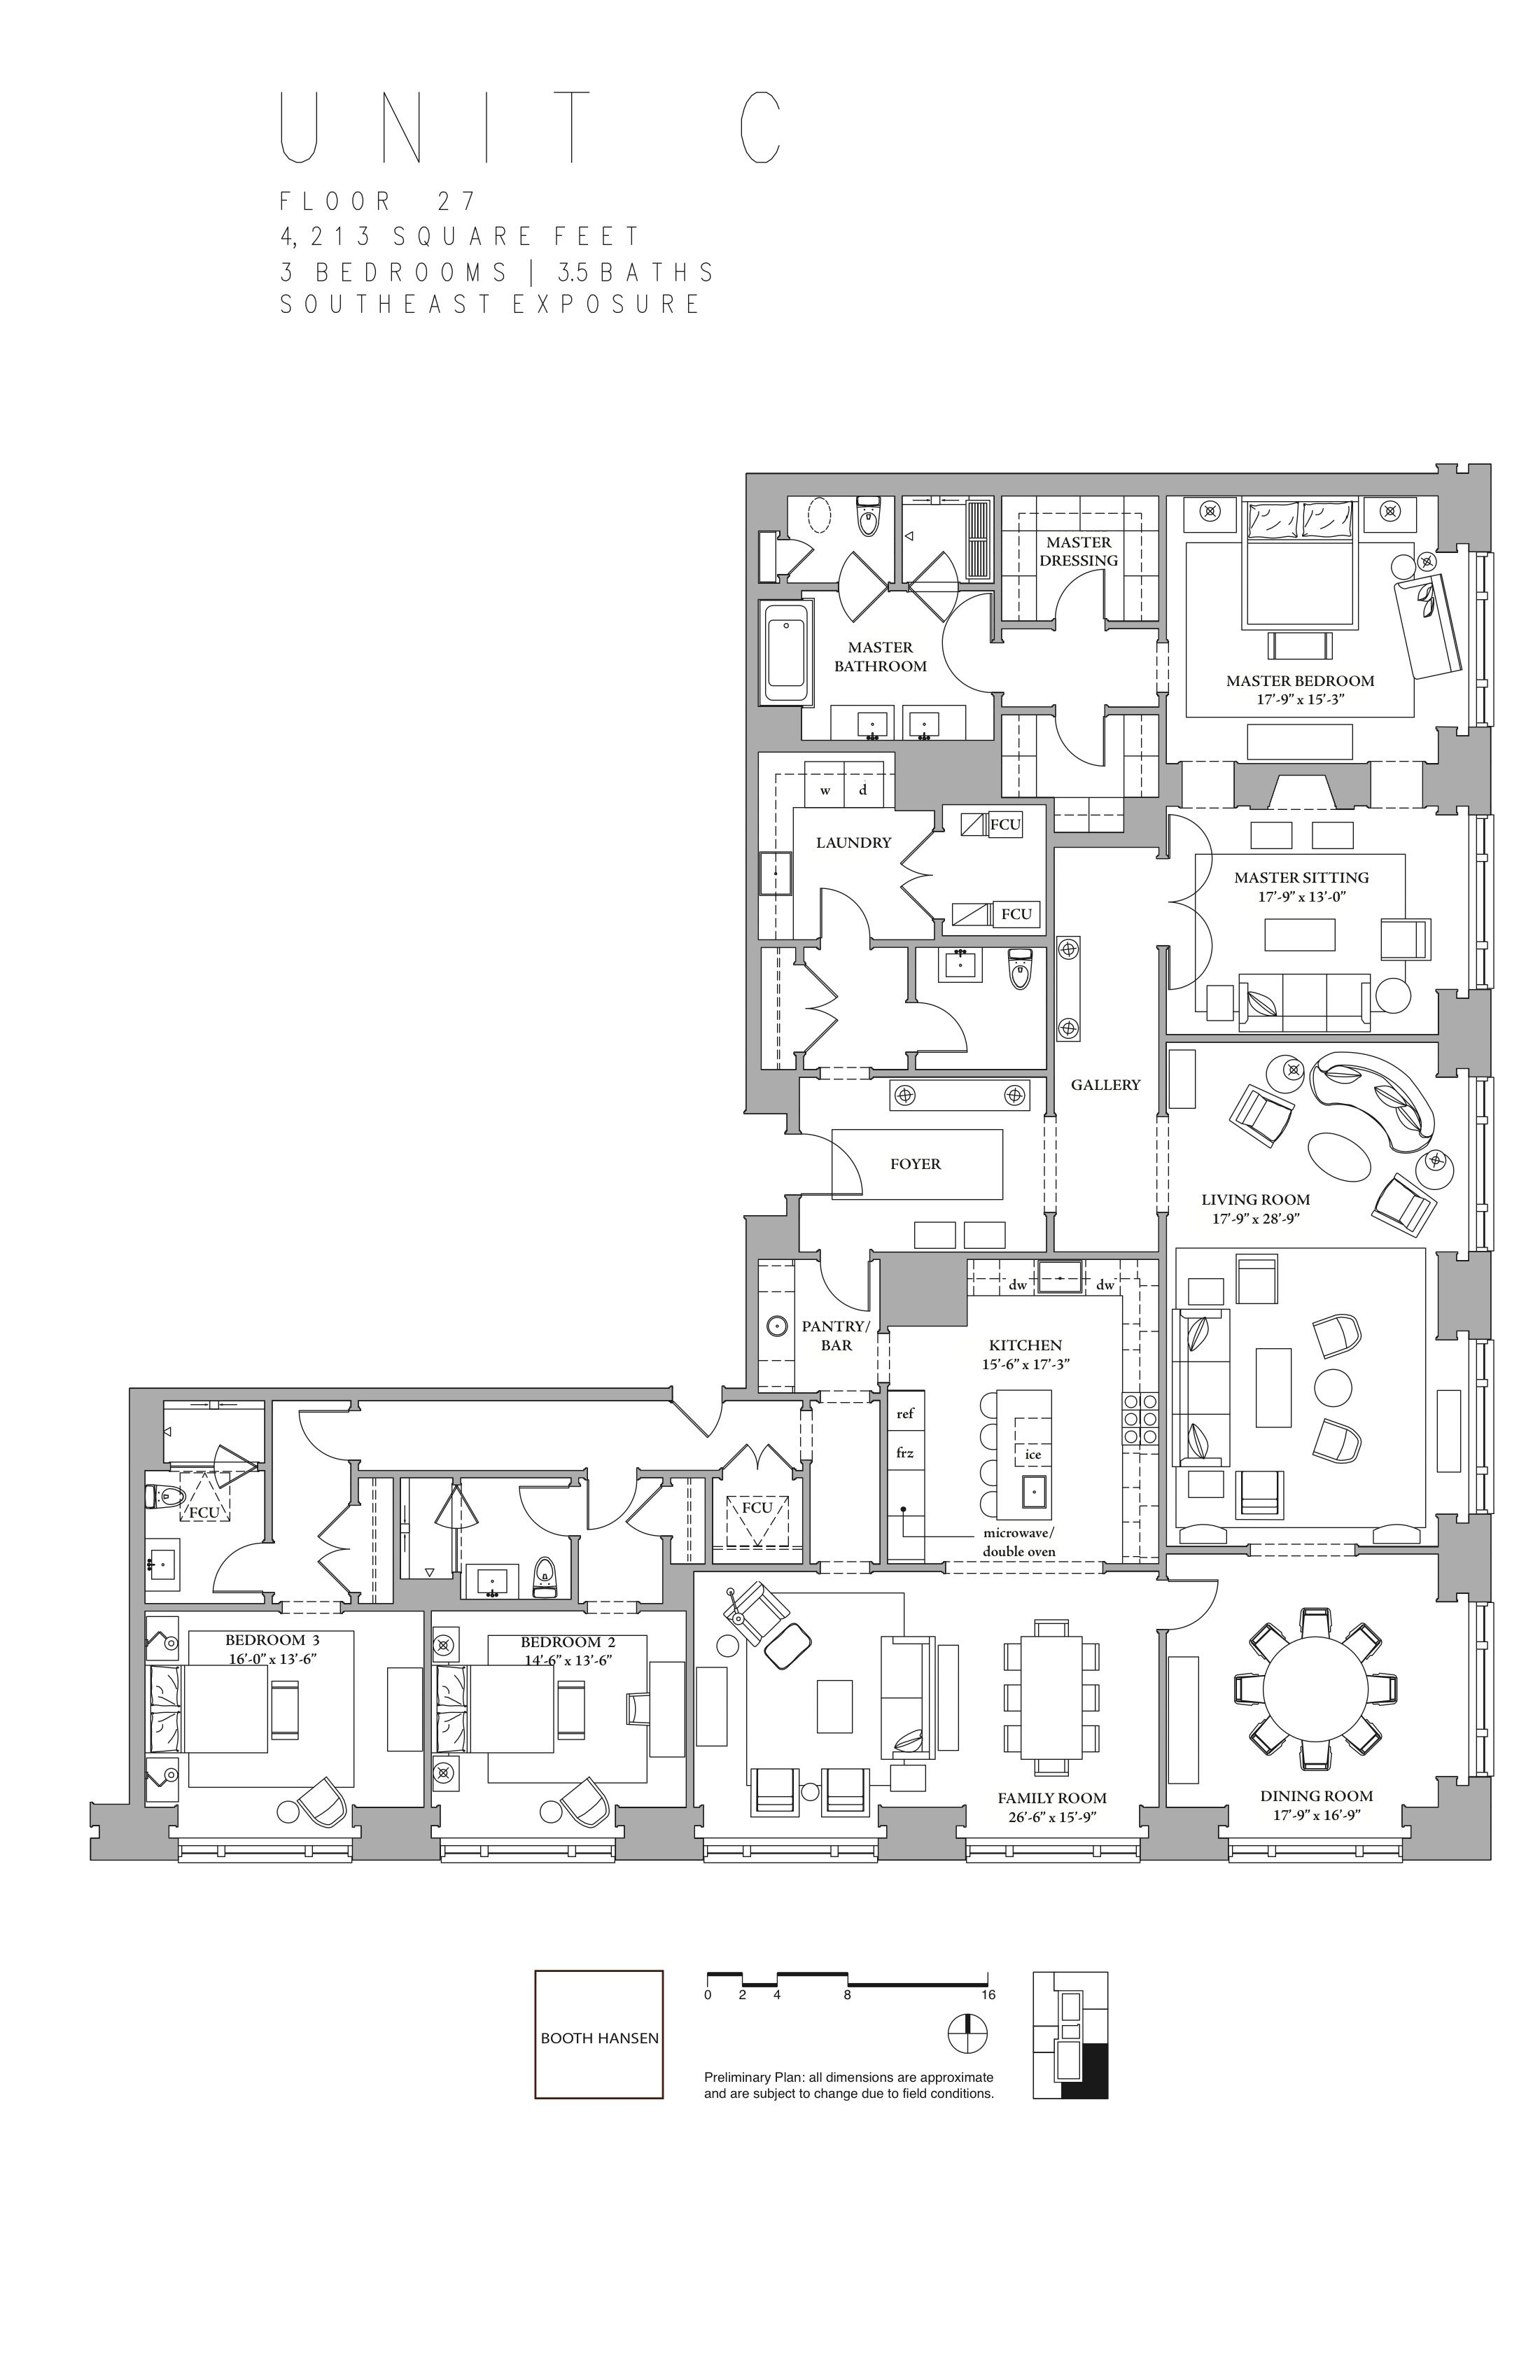 900 North Michigan Avenue Apt C What I D Imagine The Residential Floor Plan Of An International Style Tow Luxury Floor Plans Apartment Floor Plans Floor Plans